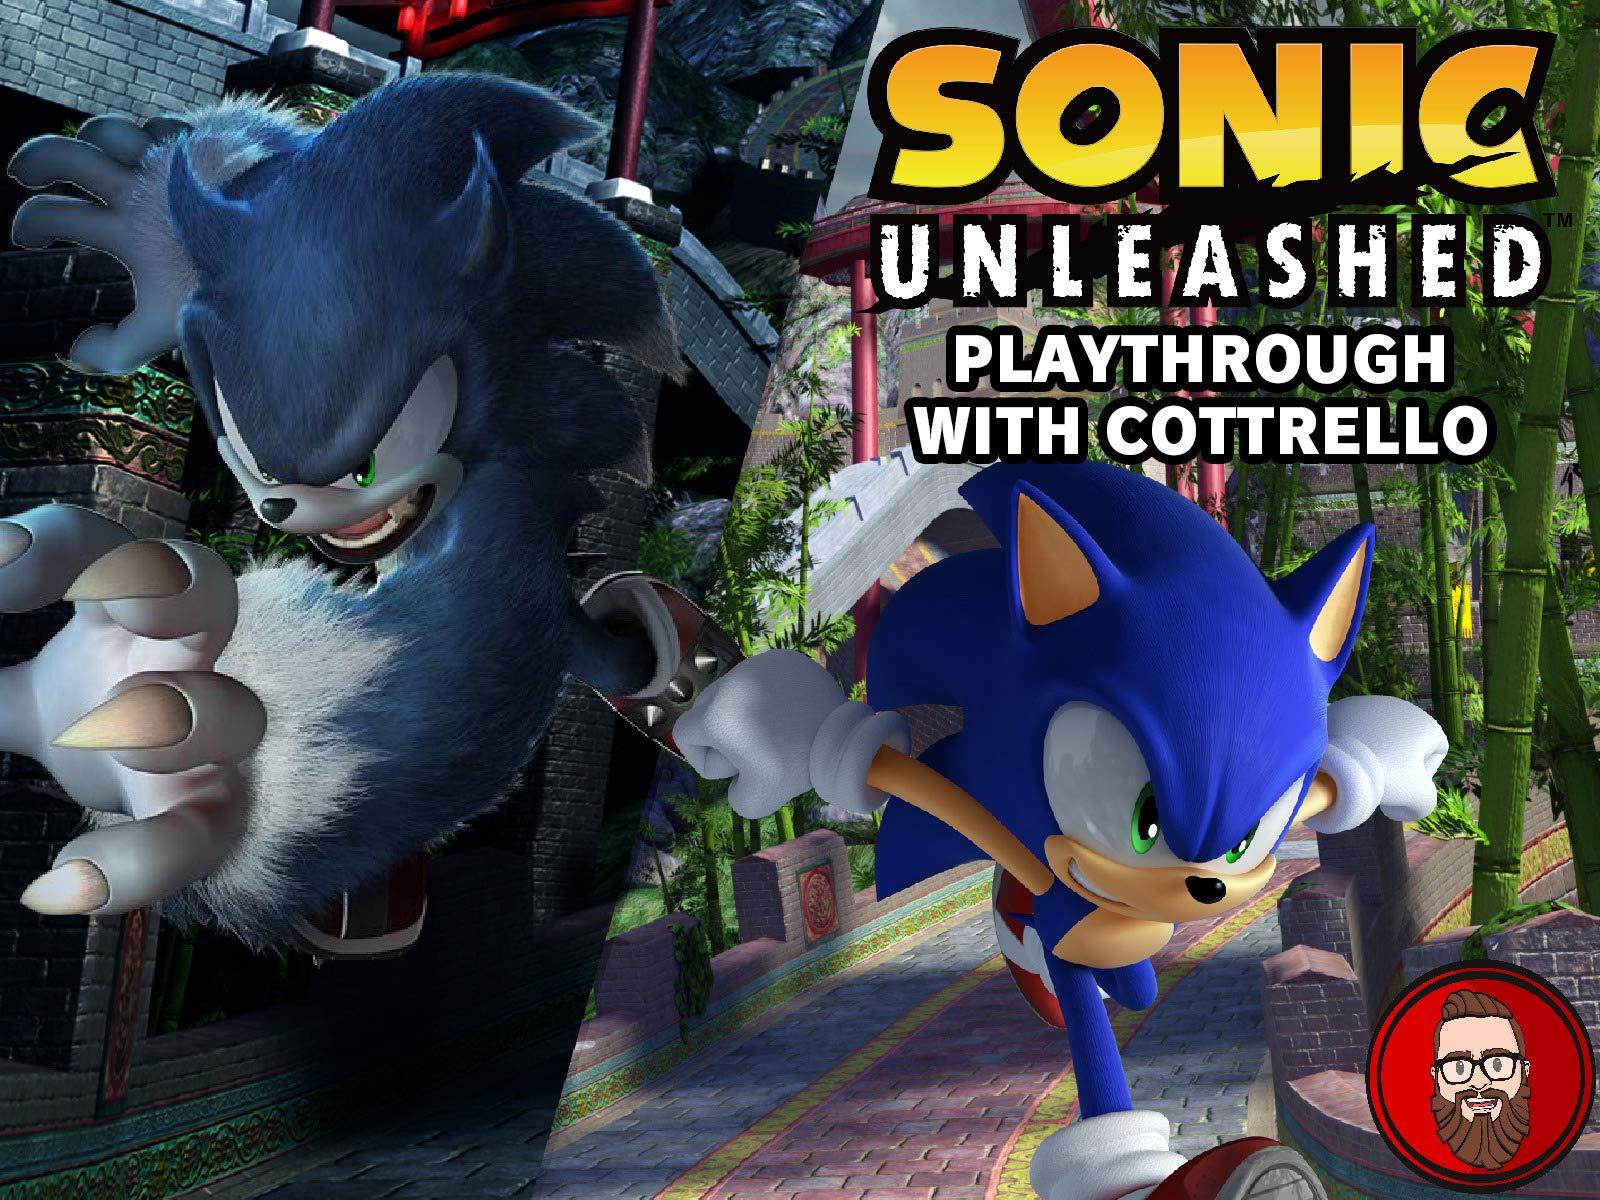 Watch Sonic Unleashed Playthrough With Cottrello On Amazon Prime Video Uk Newonamzprimeuk